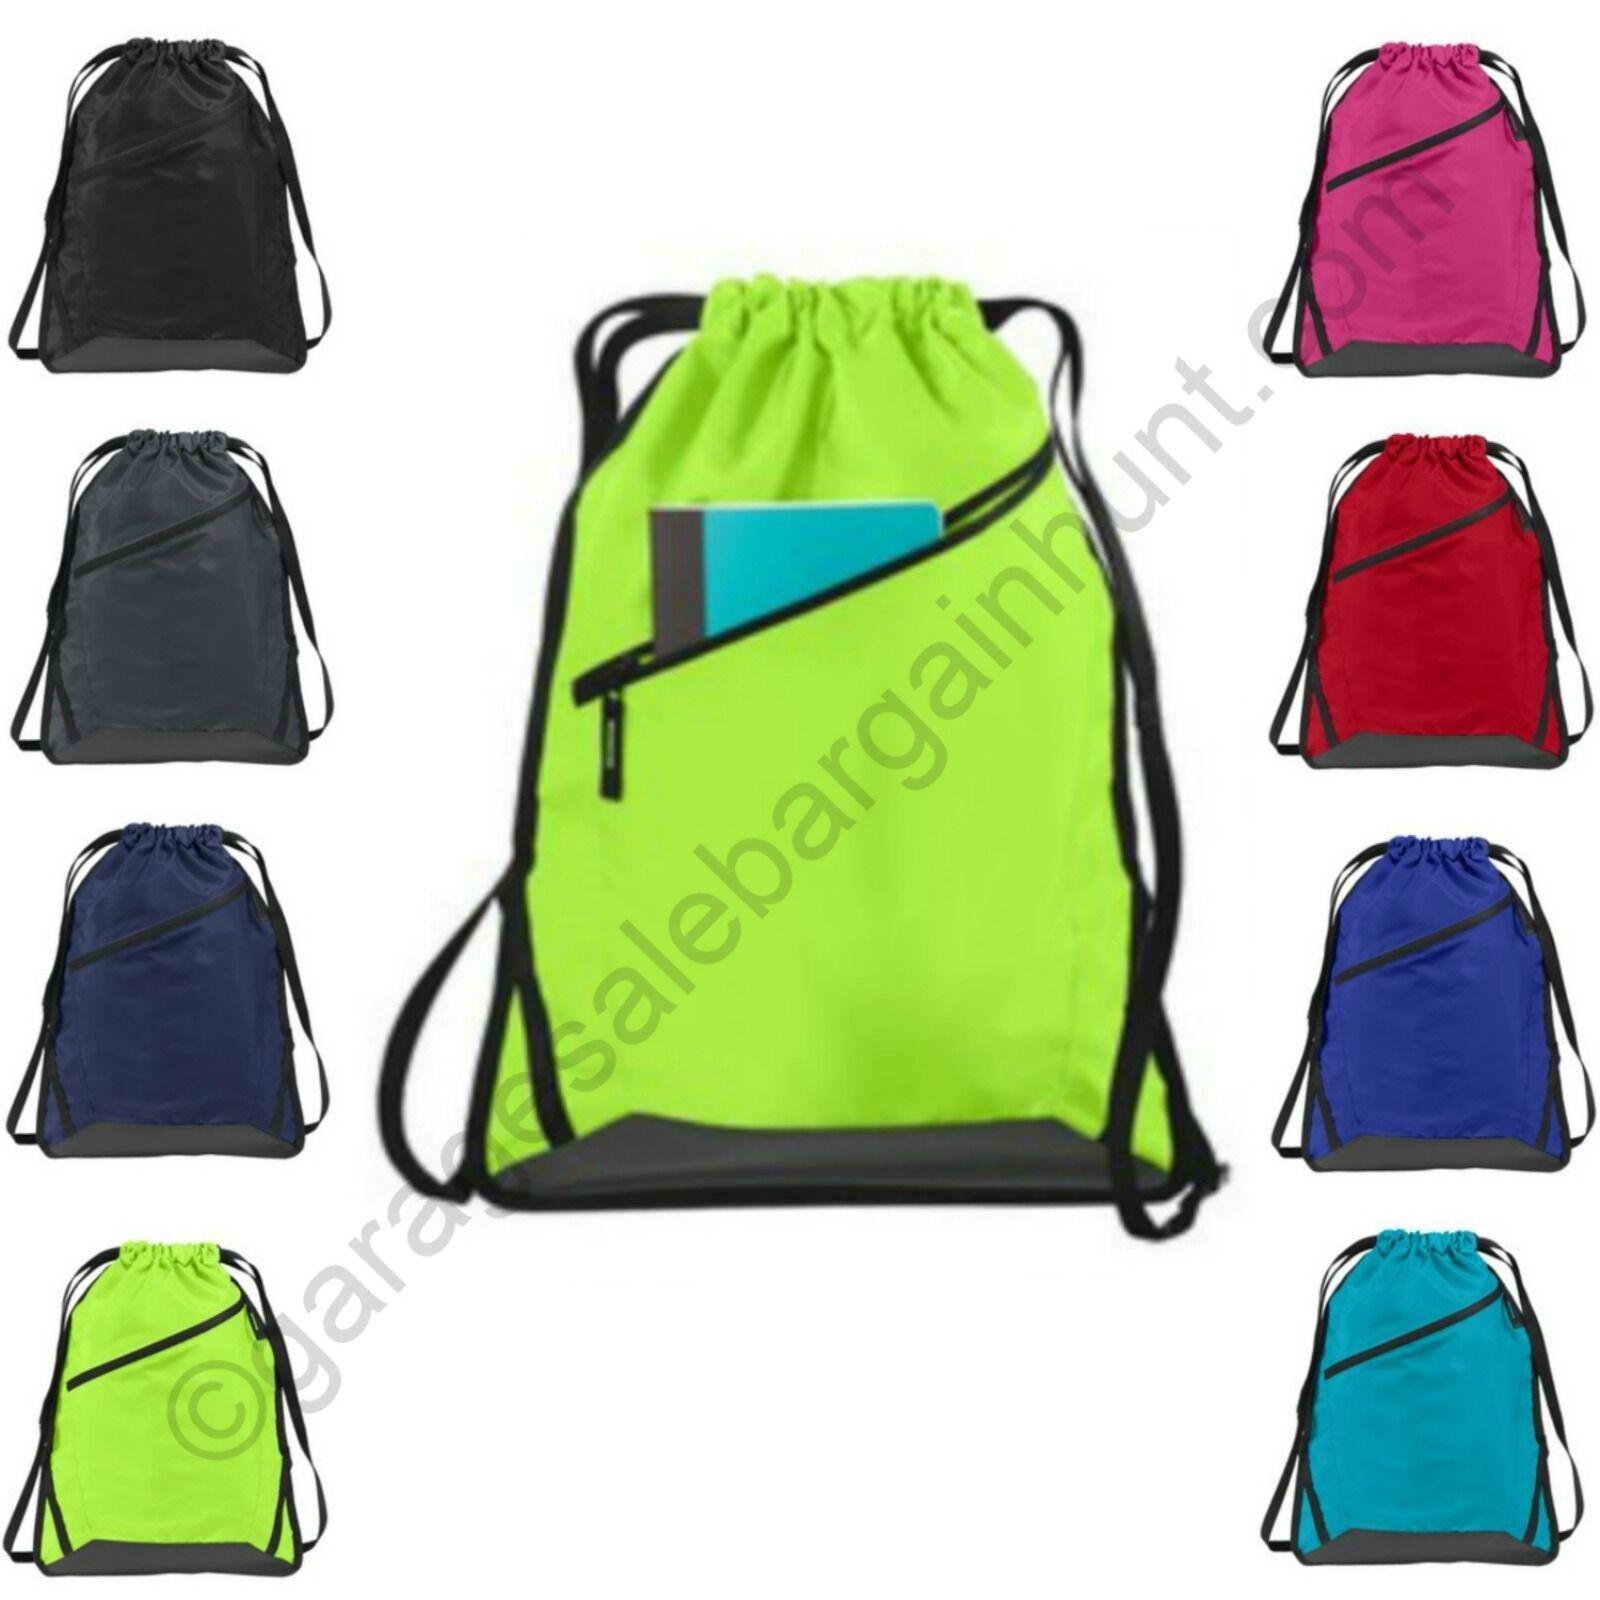 e3f7d87ac443 Details about Cinch Sack Backpack String Drawstring Backpack Gym Bag Tote  School Sport Travel